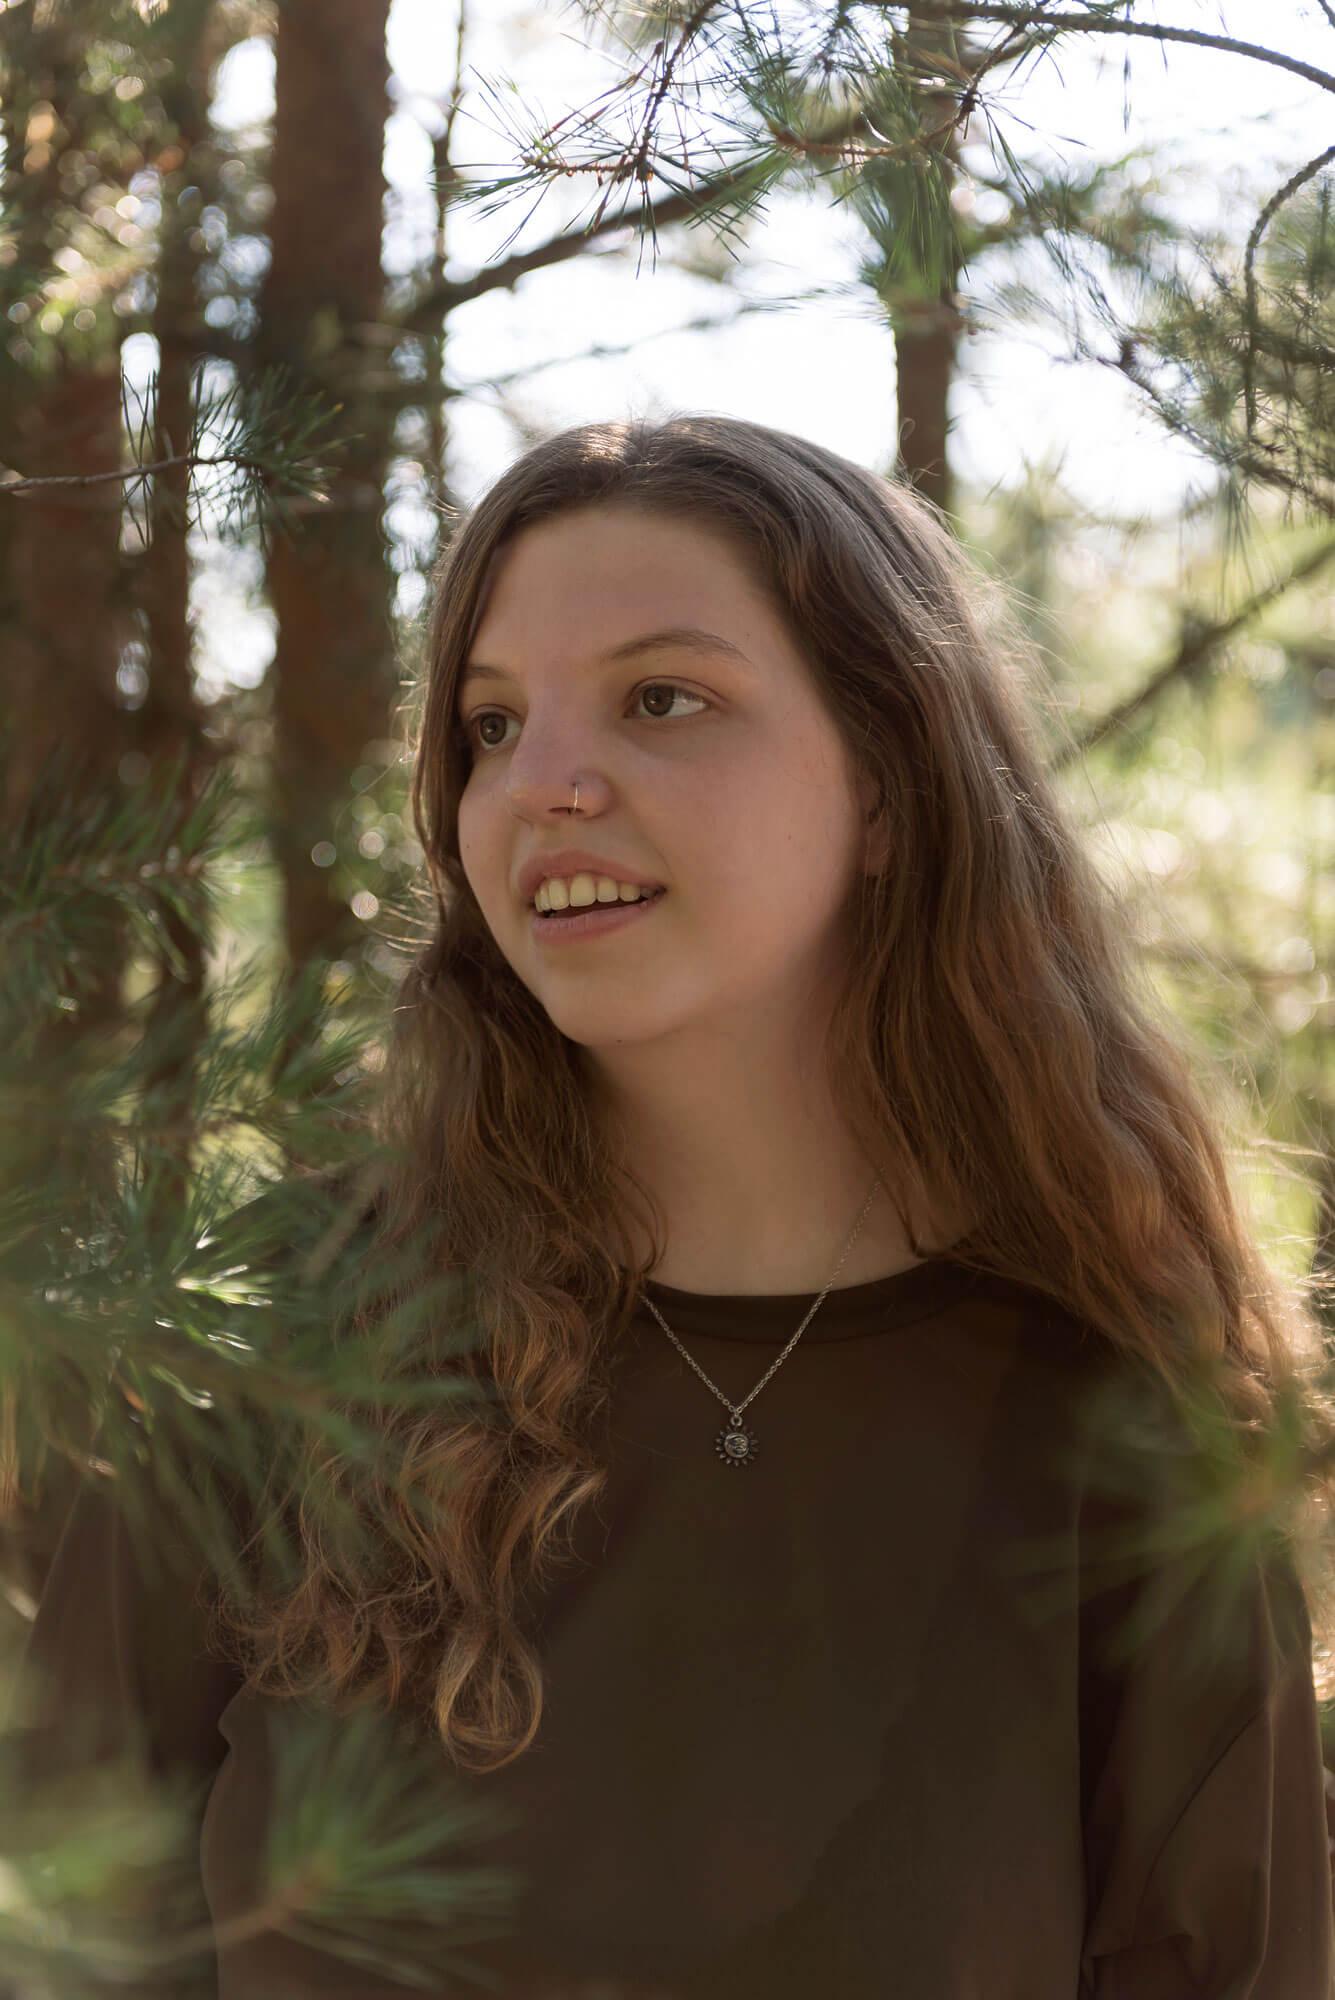 Zakelijke portretten in bos met daglicht